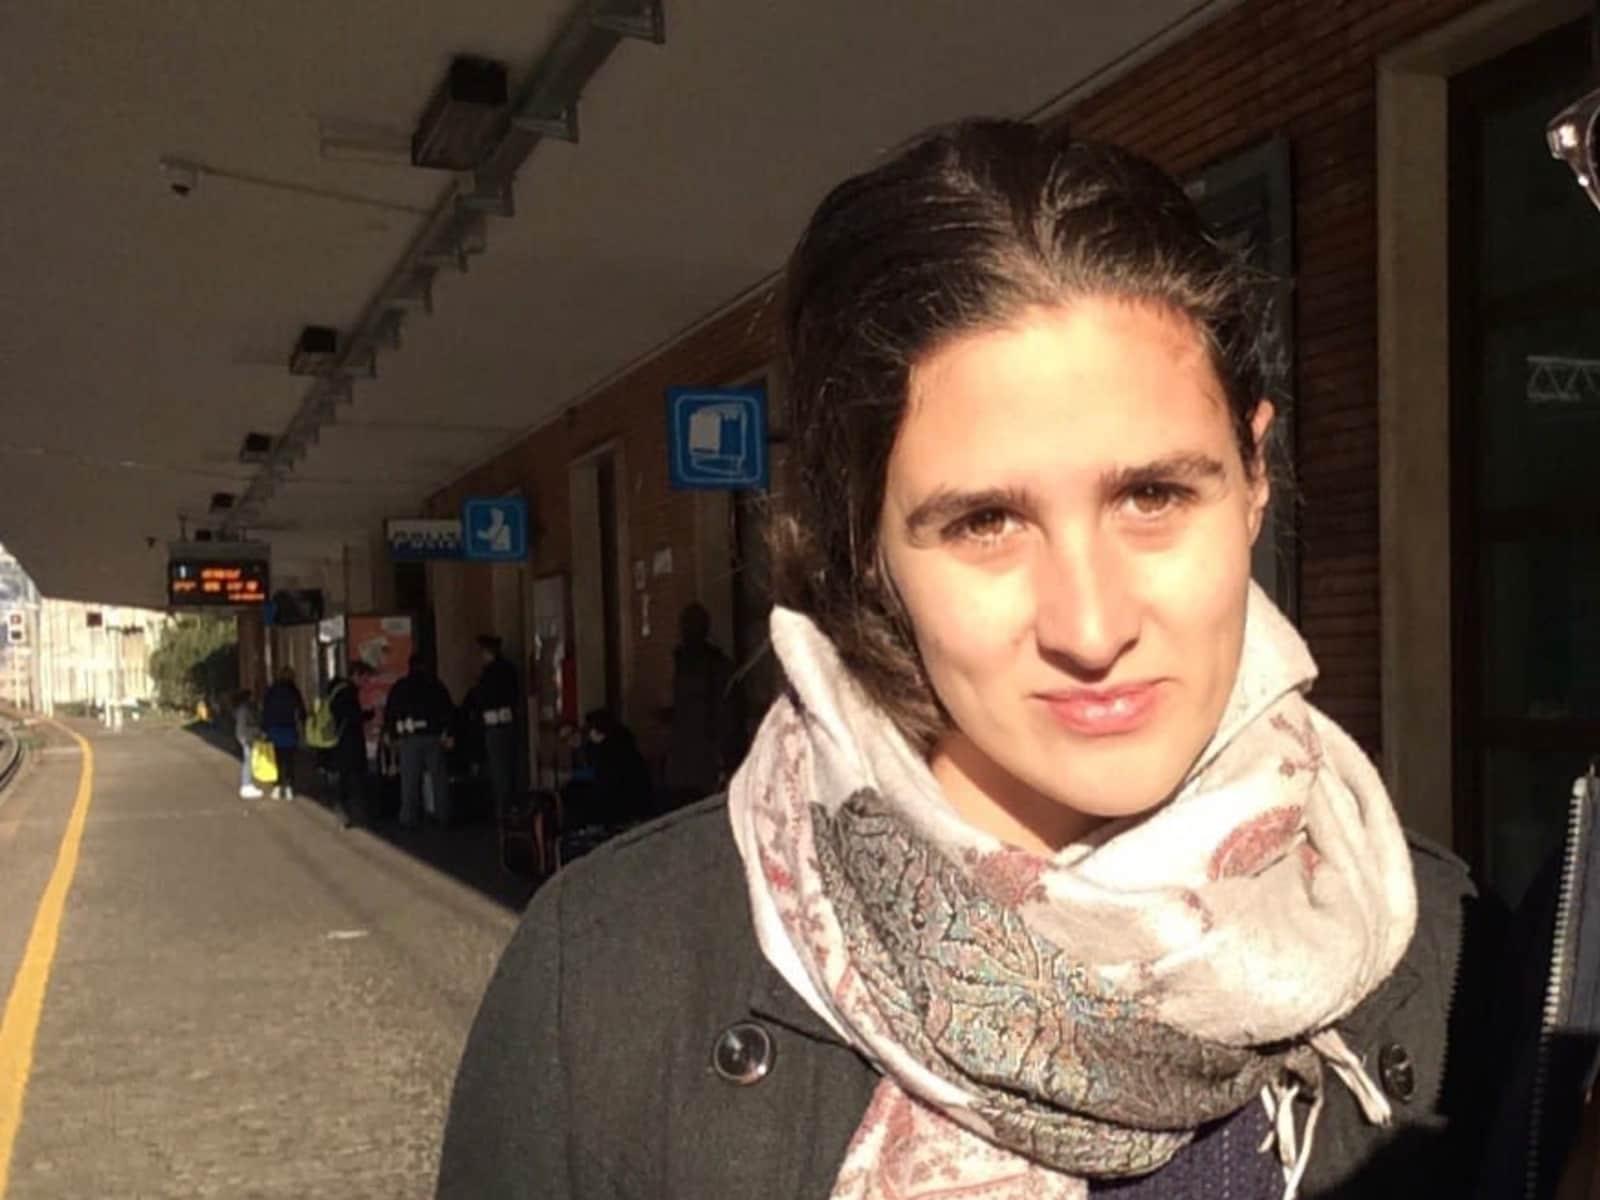 Andreane from Montréal, Quebec, Canada